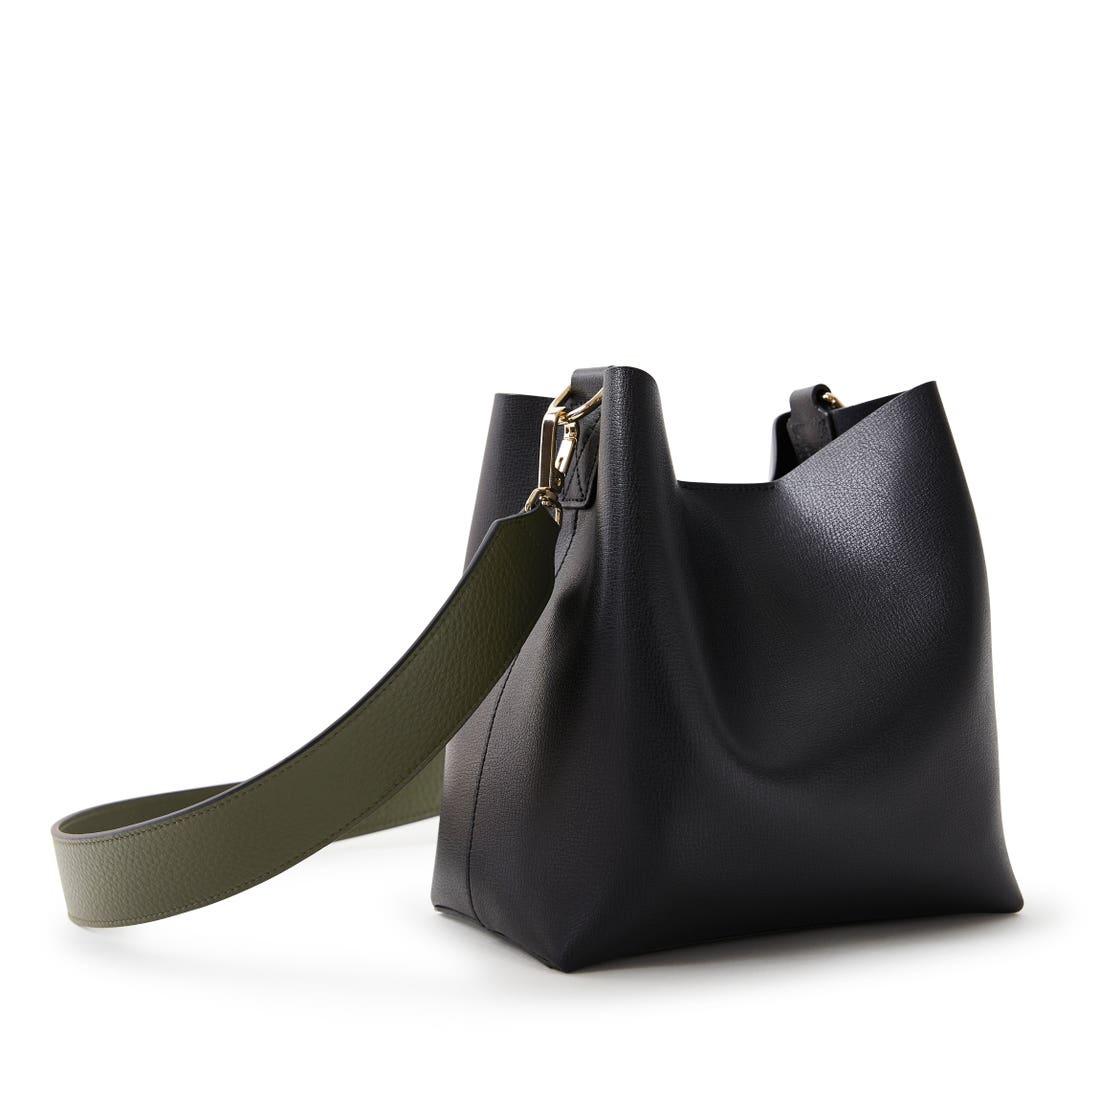 Elizabeth Small Crossbody Bucket Bag